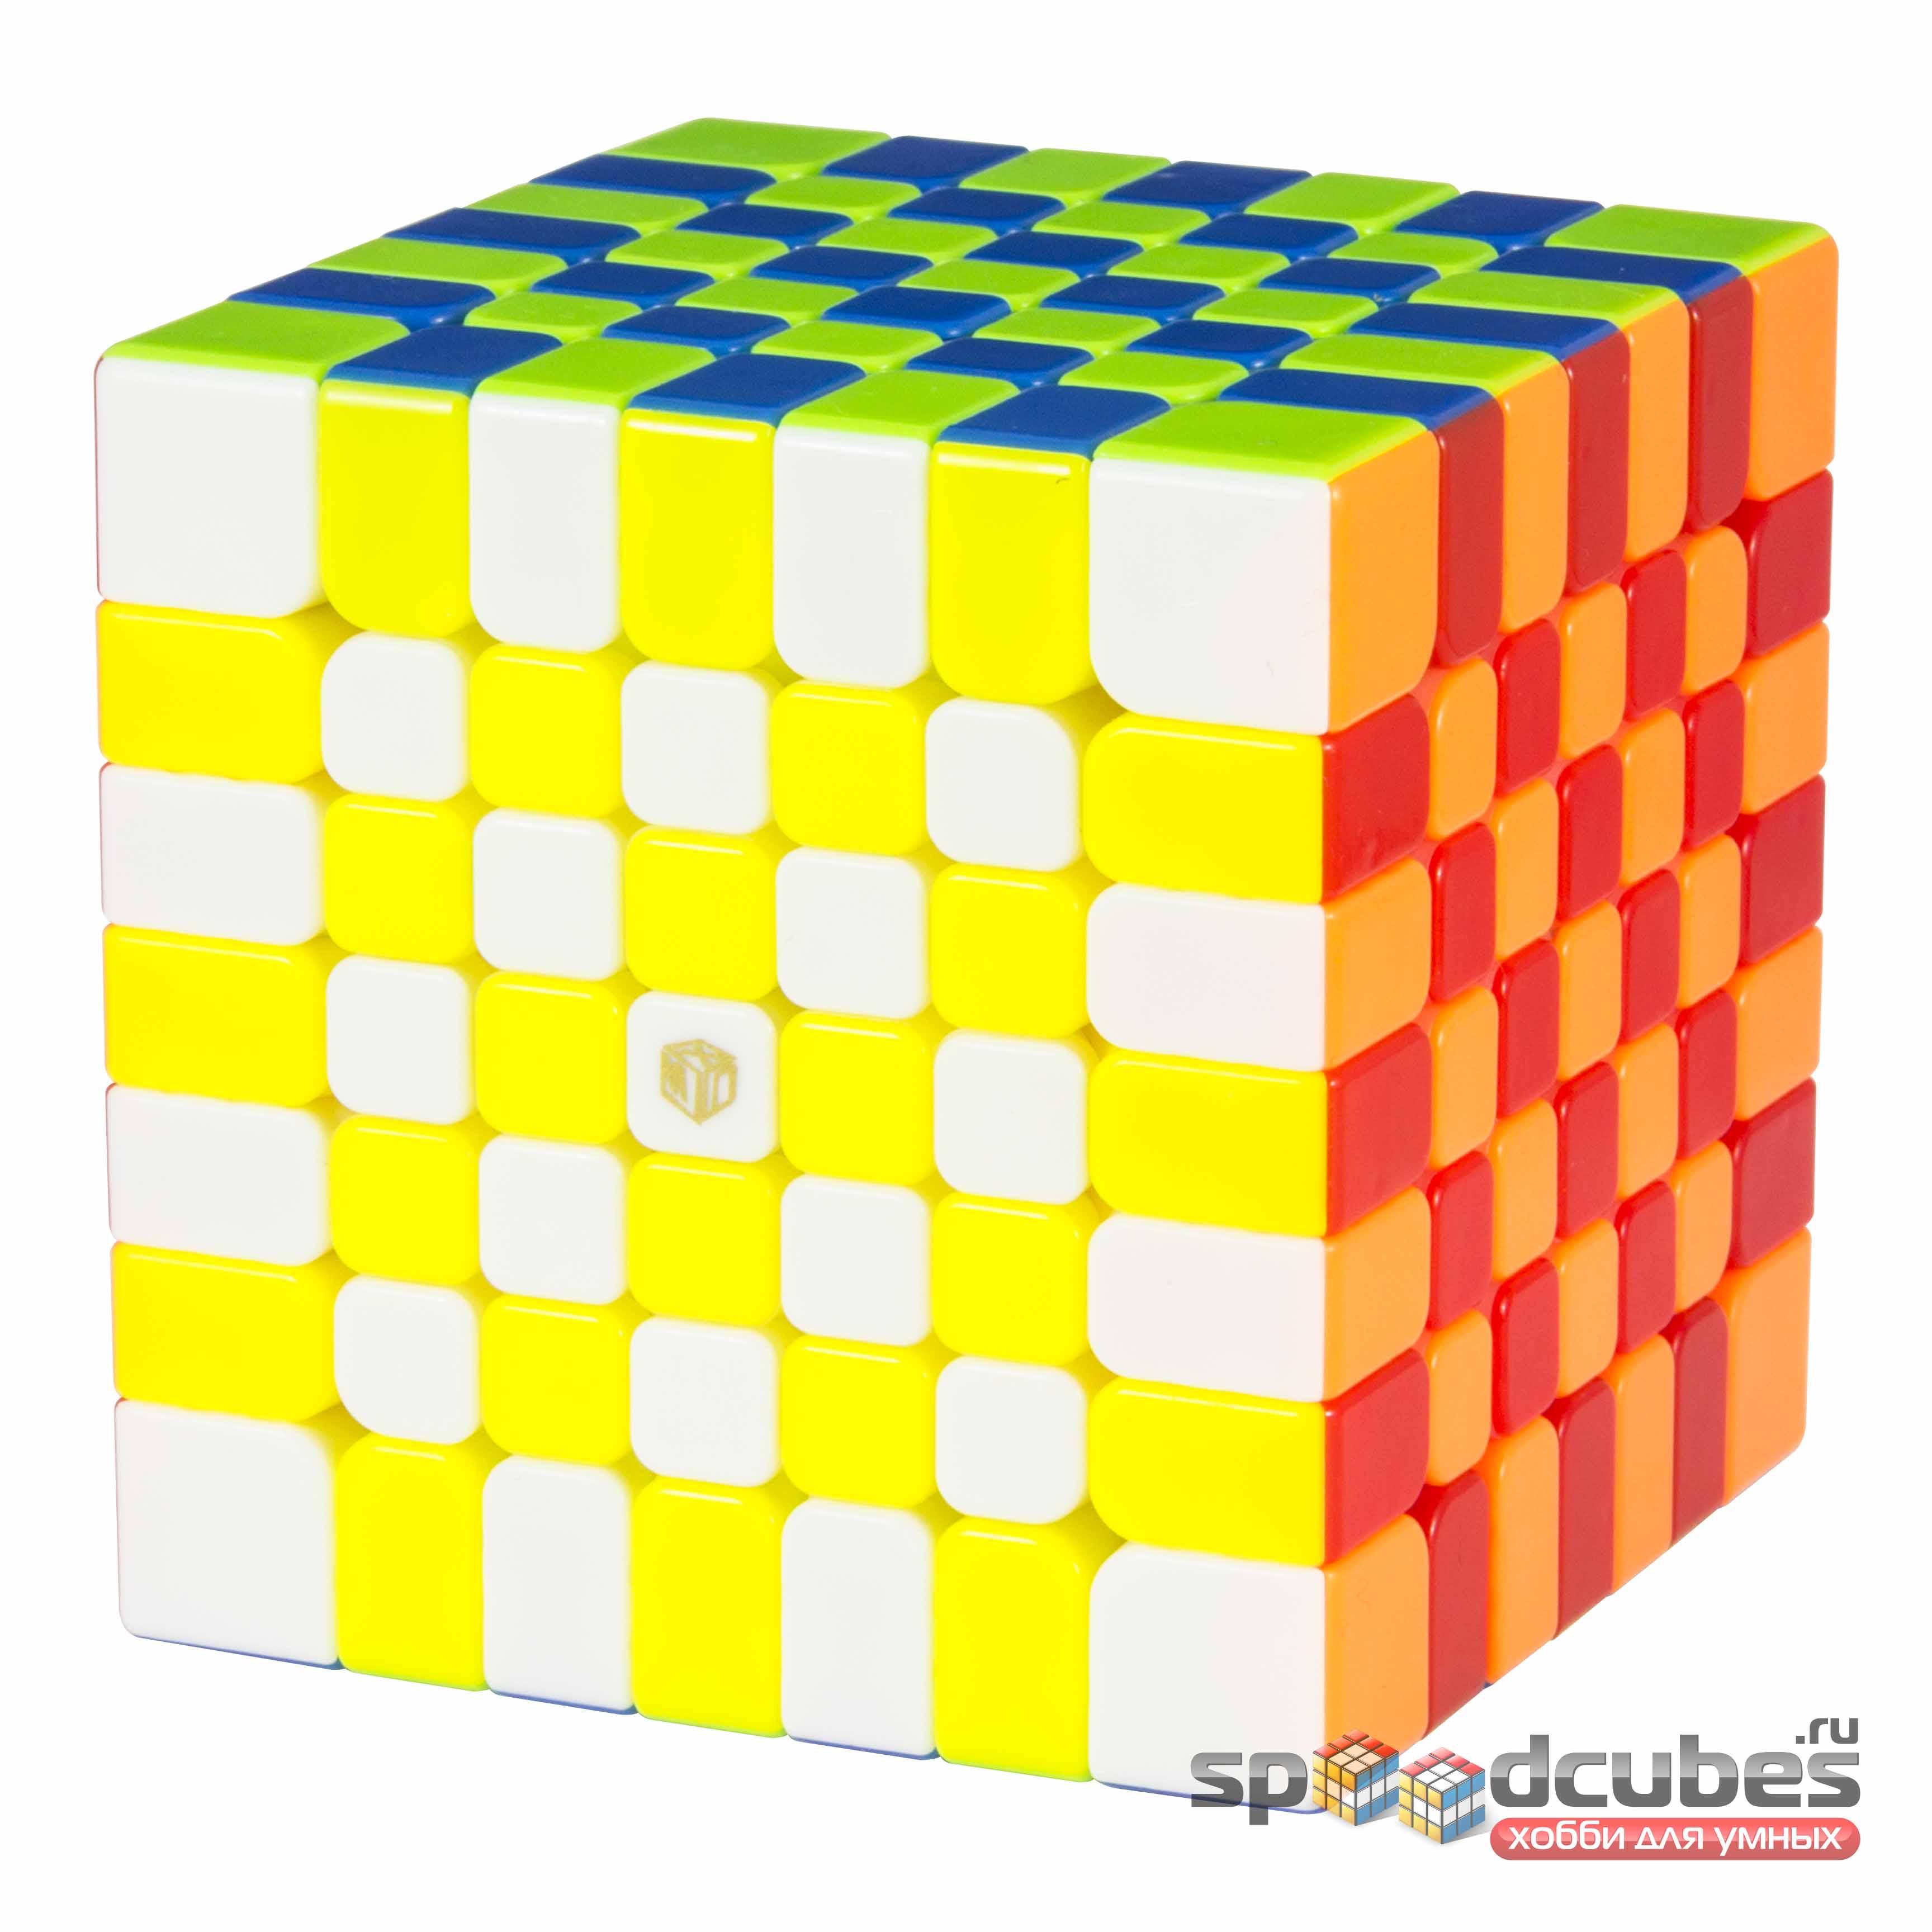 QiYi (MoFangGe) 7x7x7 Spark M Color 2